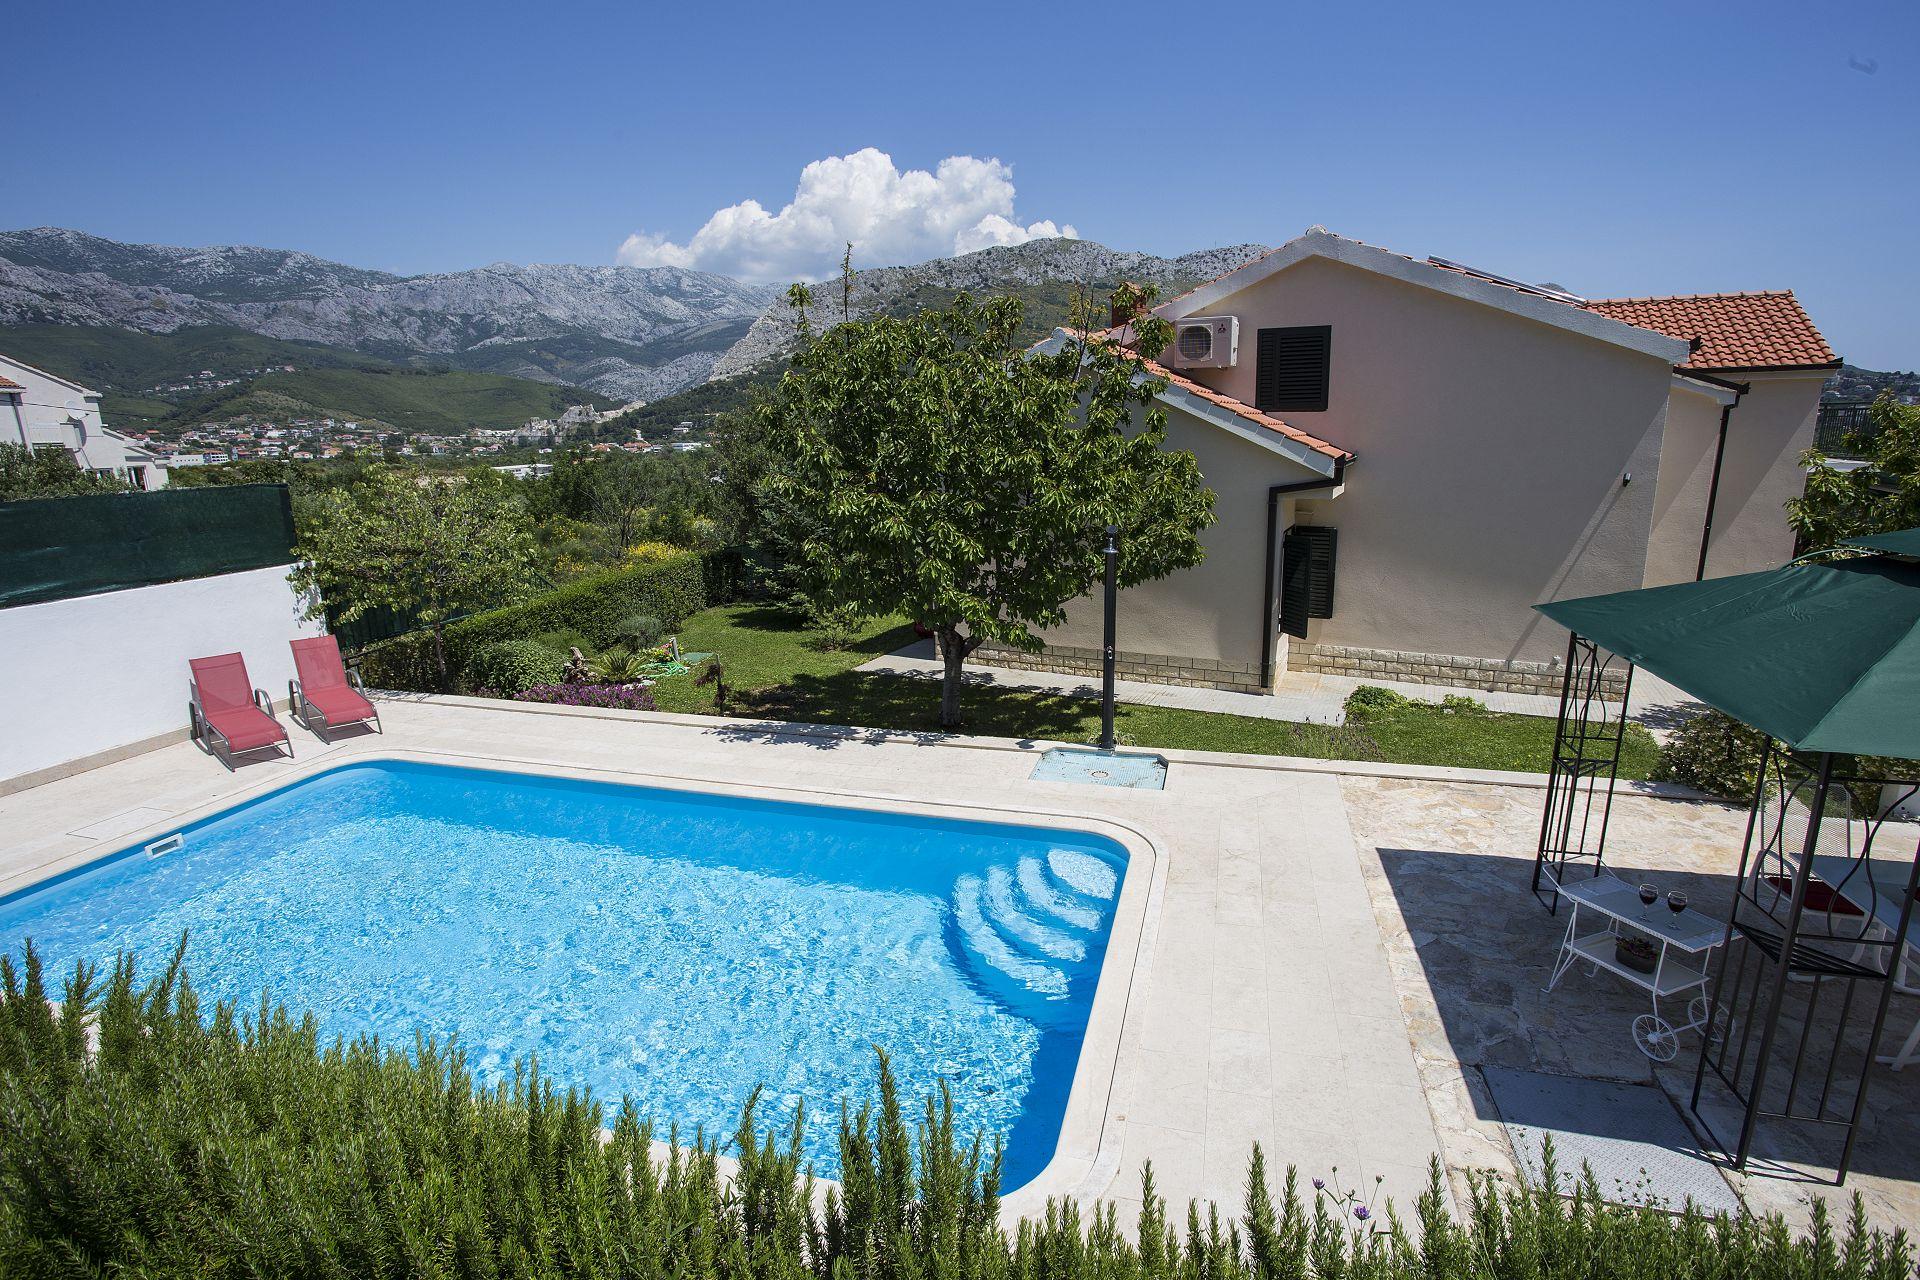 38923 - Split - Vakantiehuizen, villa´s Kroatië